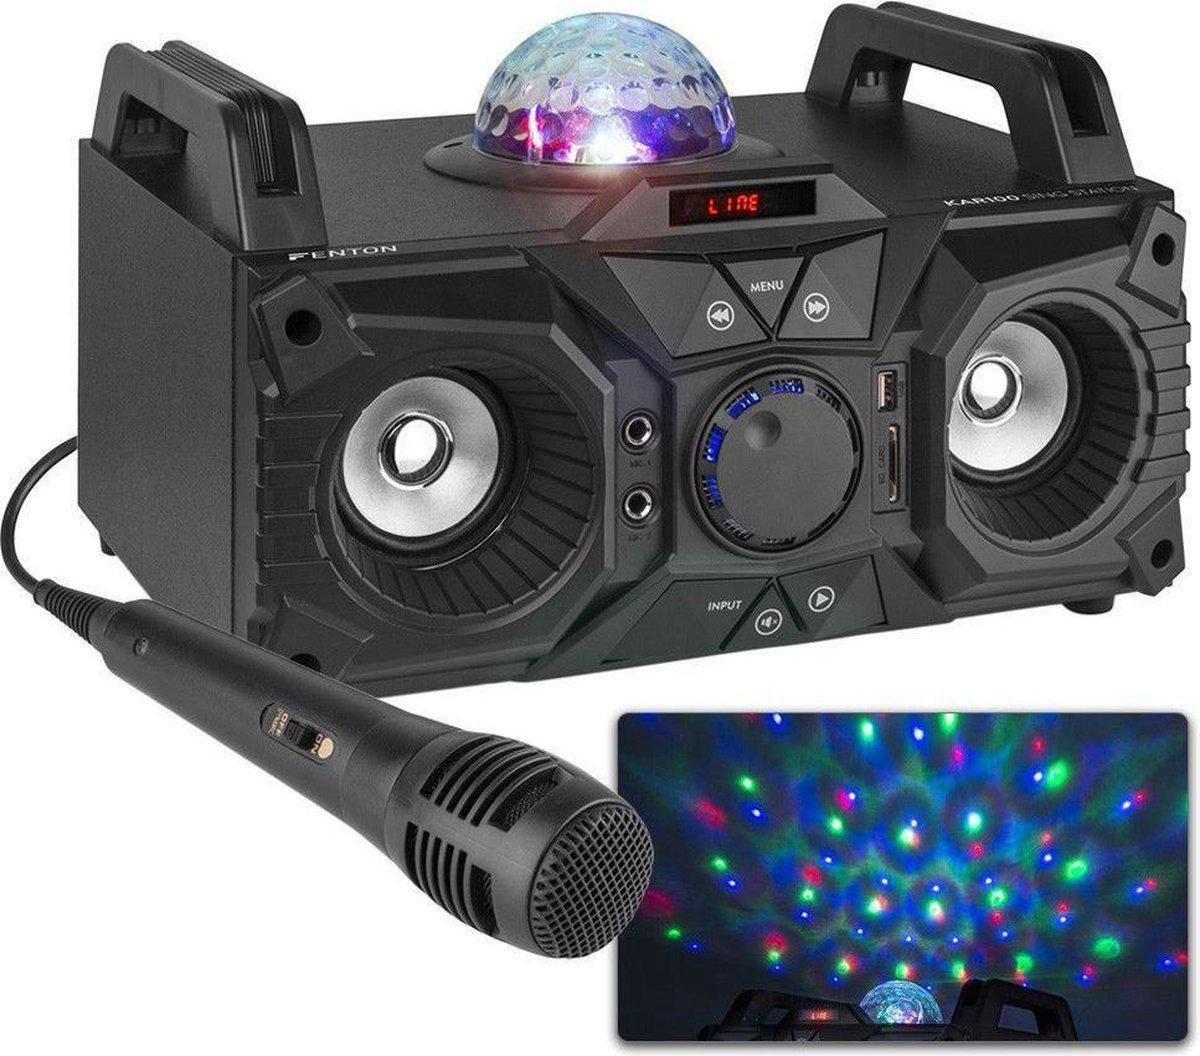 Karaokeset - Fenton KAR100 Singstation met microfoon, Bluetooth, mp3 speler en LED lichteffect